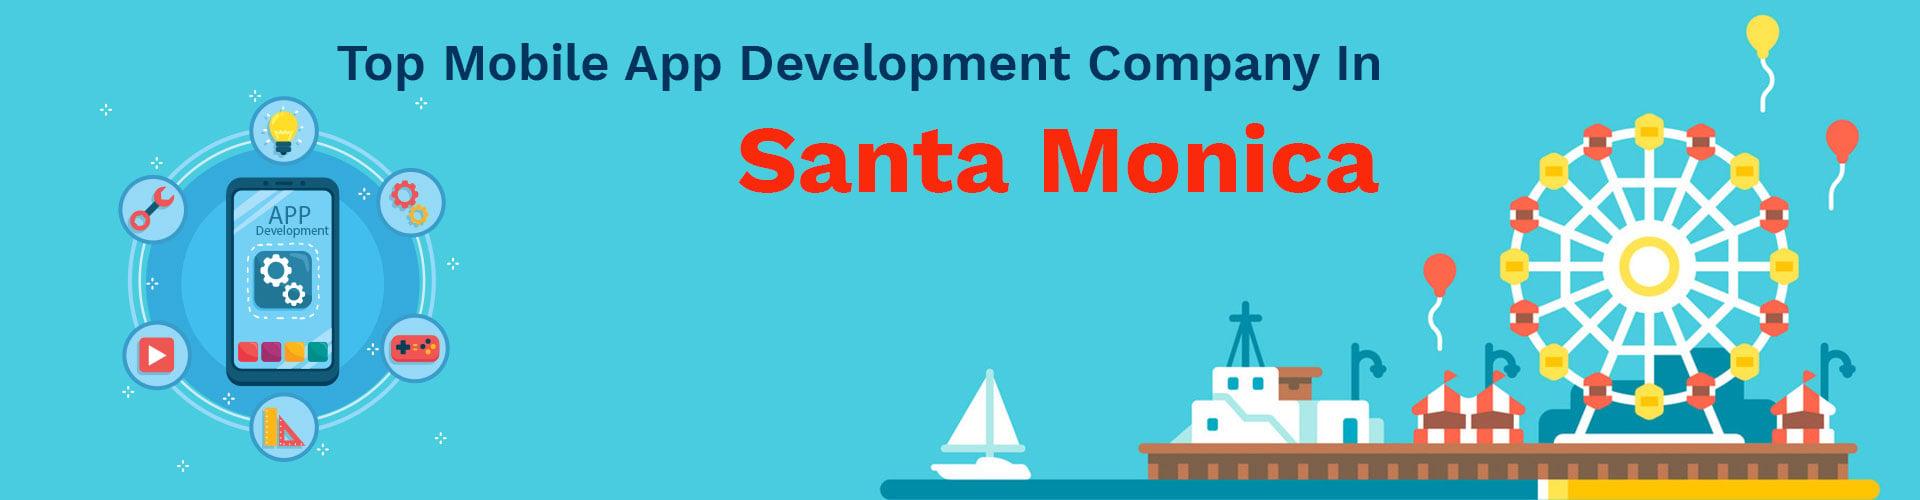 mobile app development company santa monica